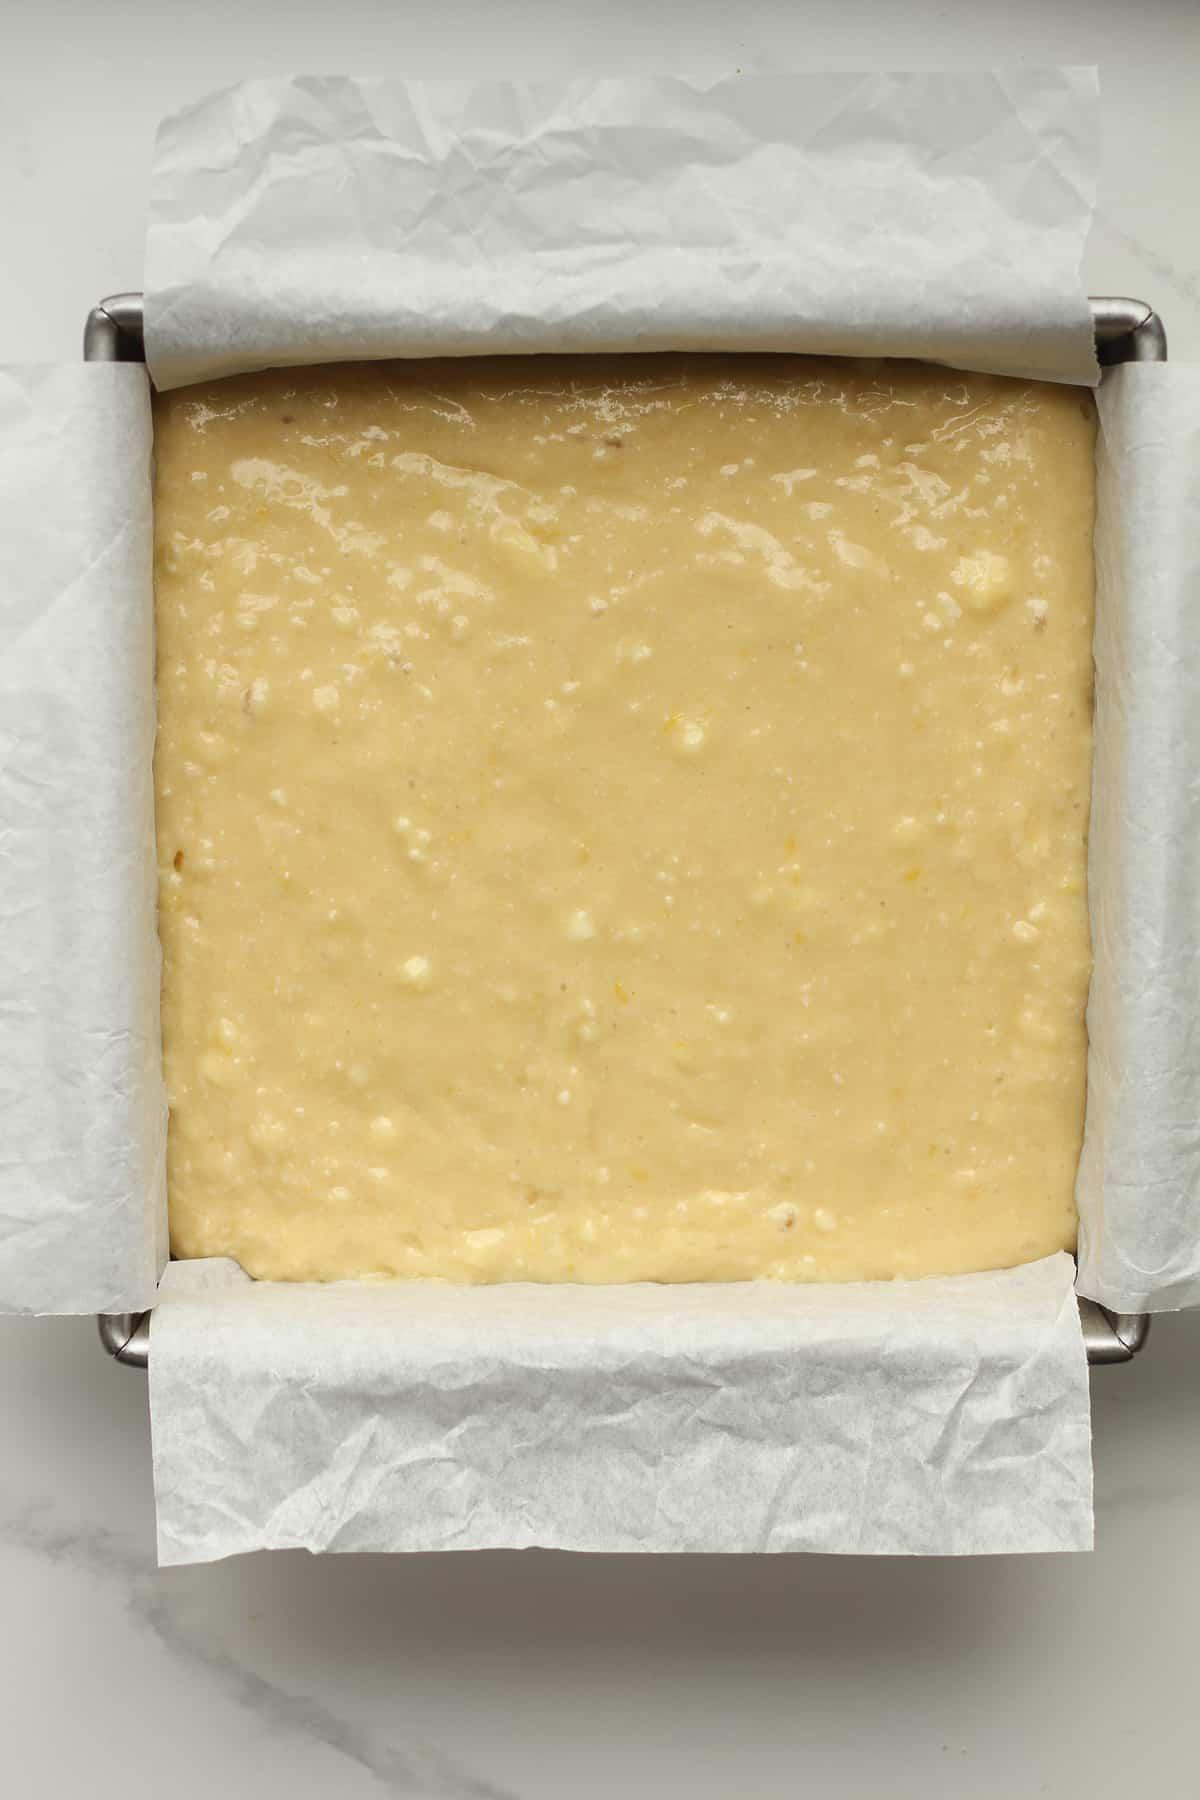 A pan of the batter of lemon cake.